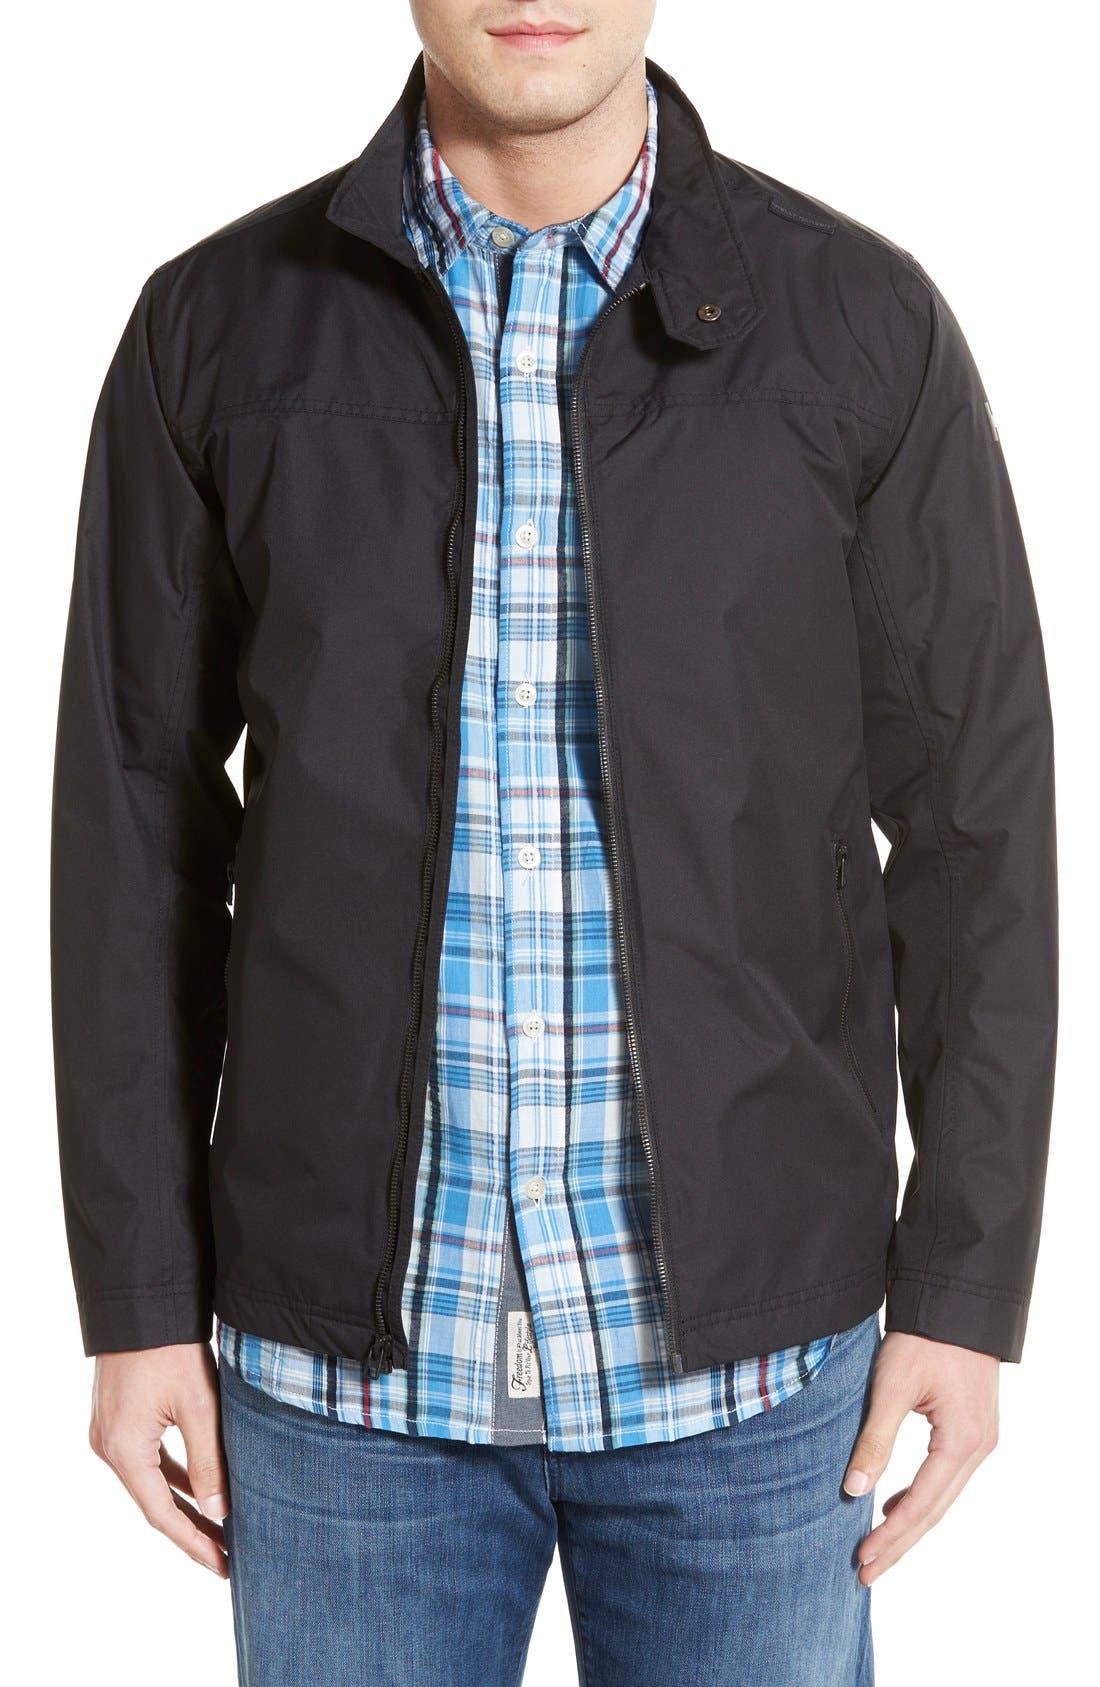 HELLY HANSEN 'Derry' Waterproof Jacket, Main, color, 009